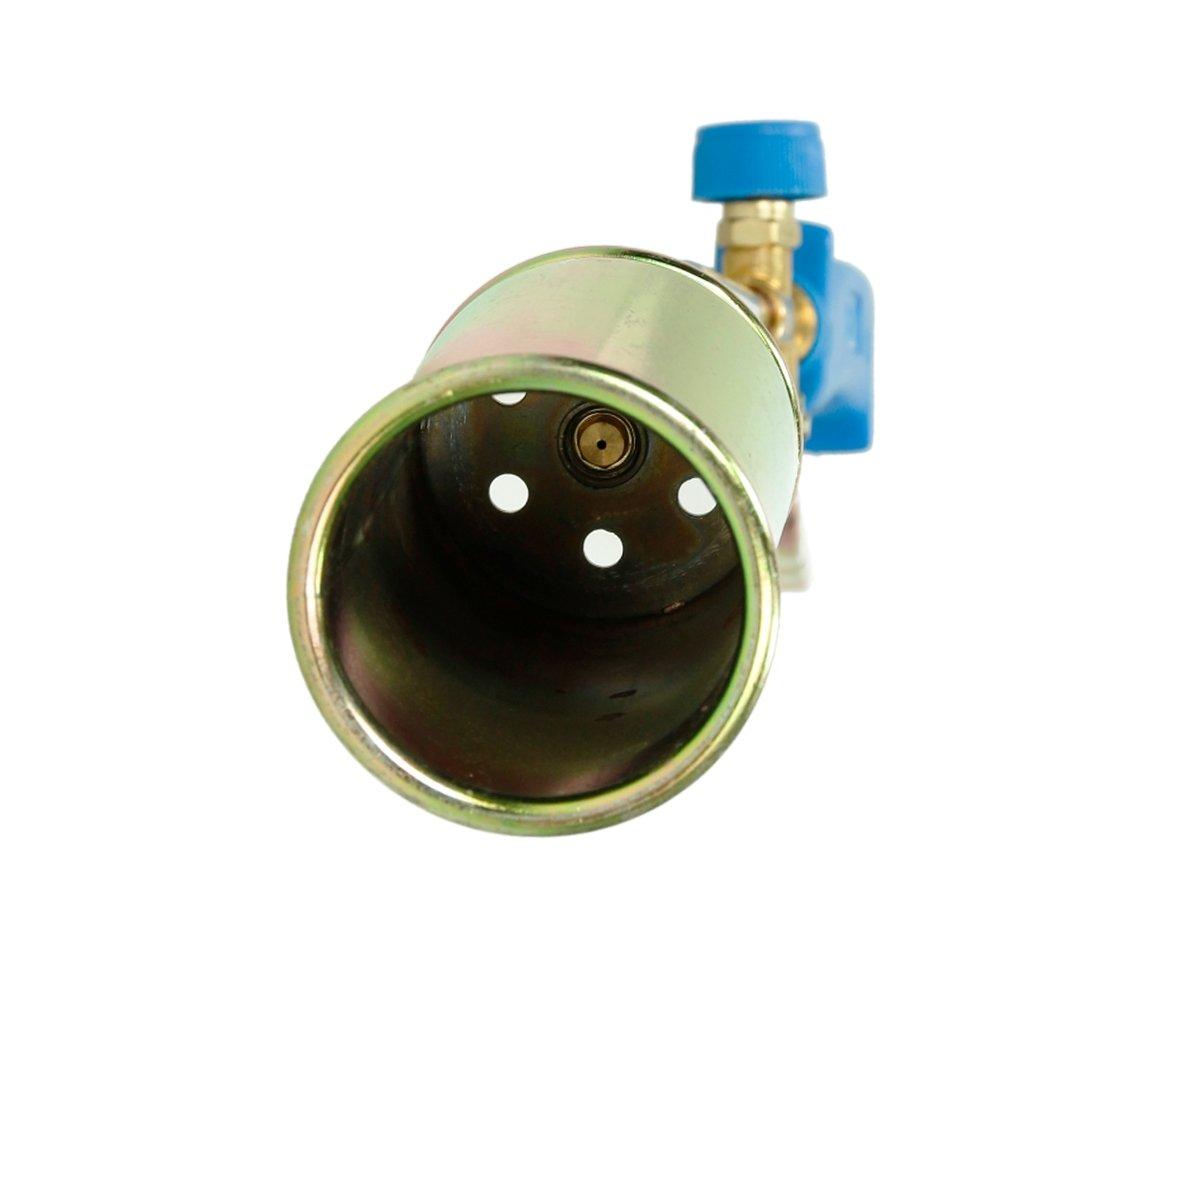 ECD Germany Long Arm Gas Torch Burber Heater 45cm Long 58KW wiht 3m Hose